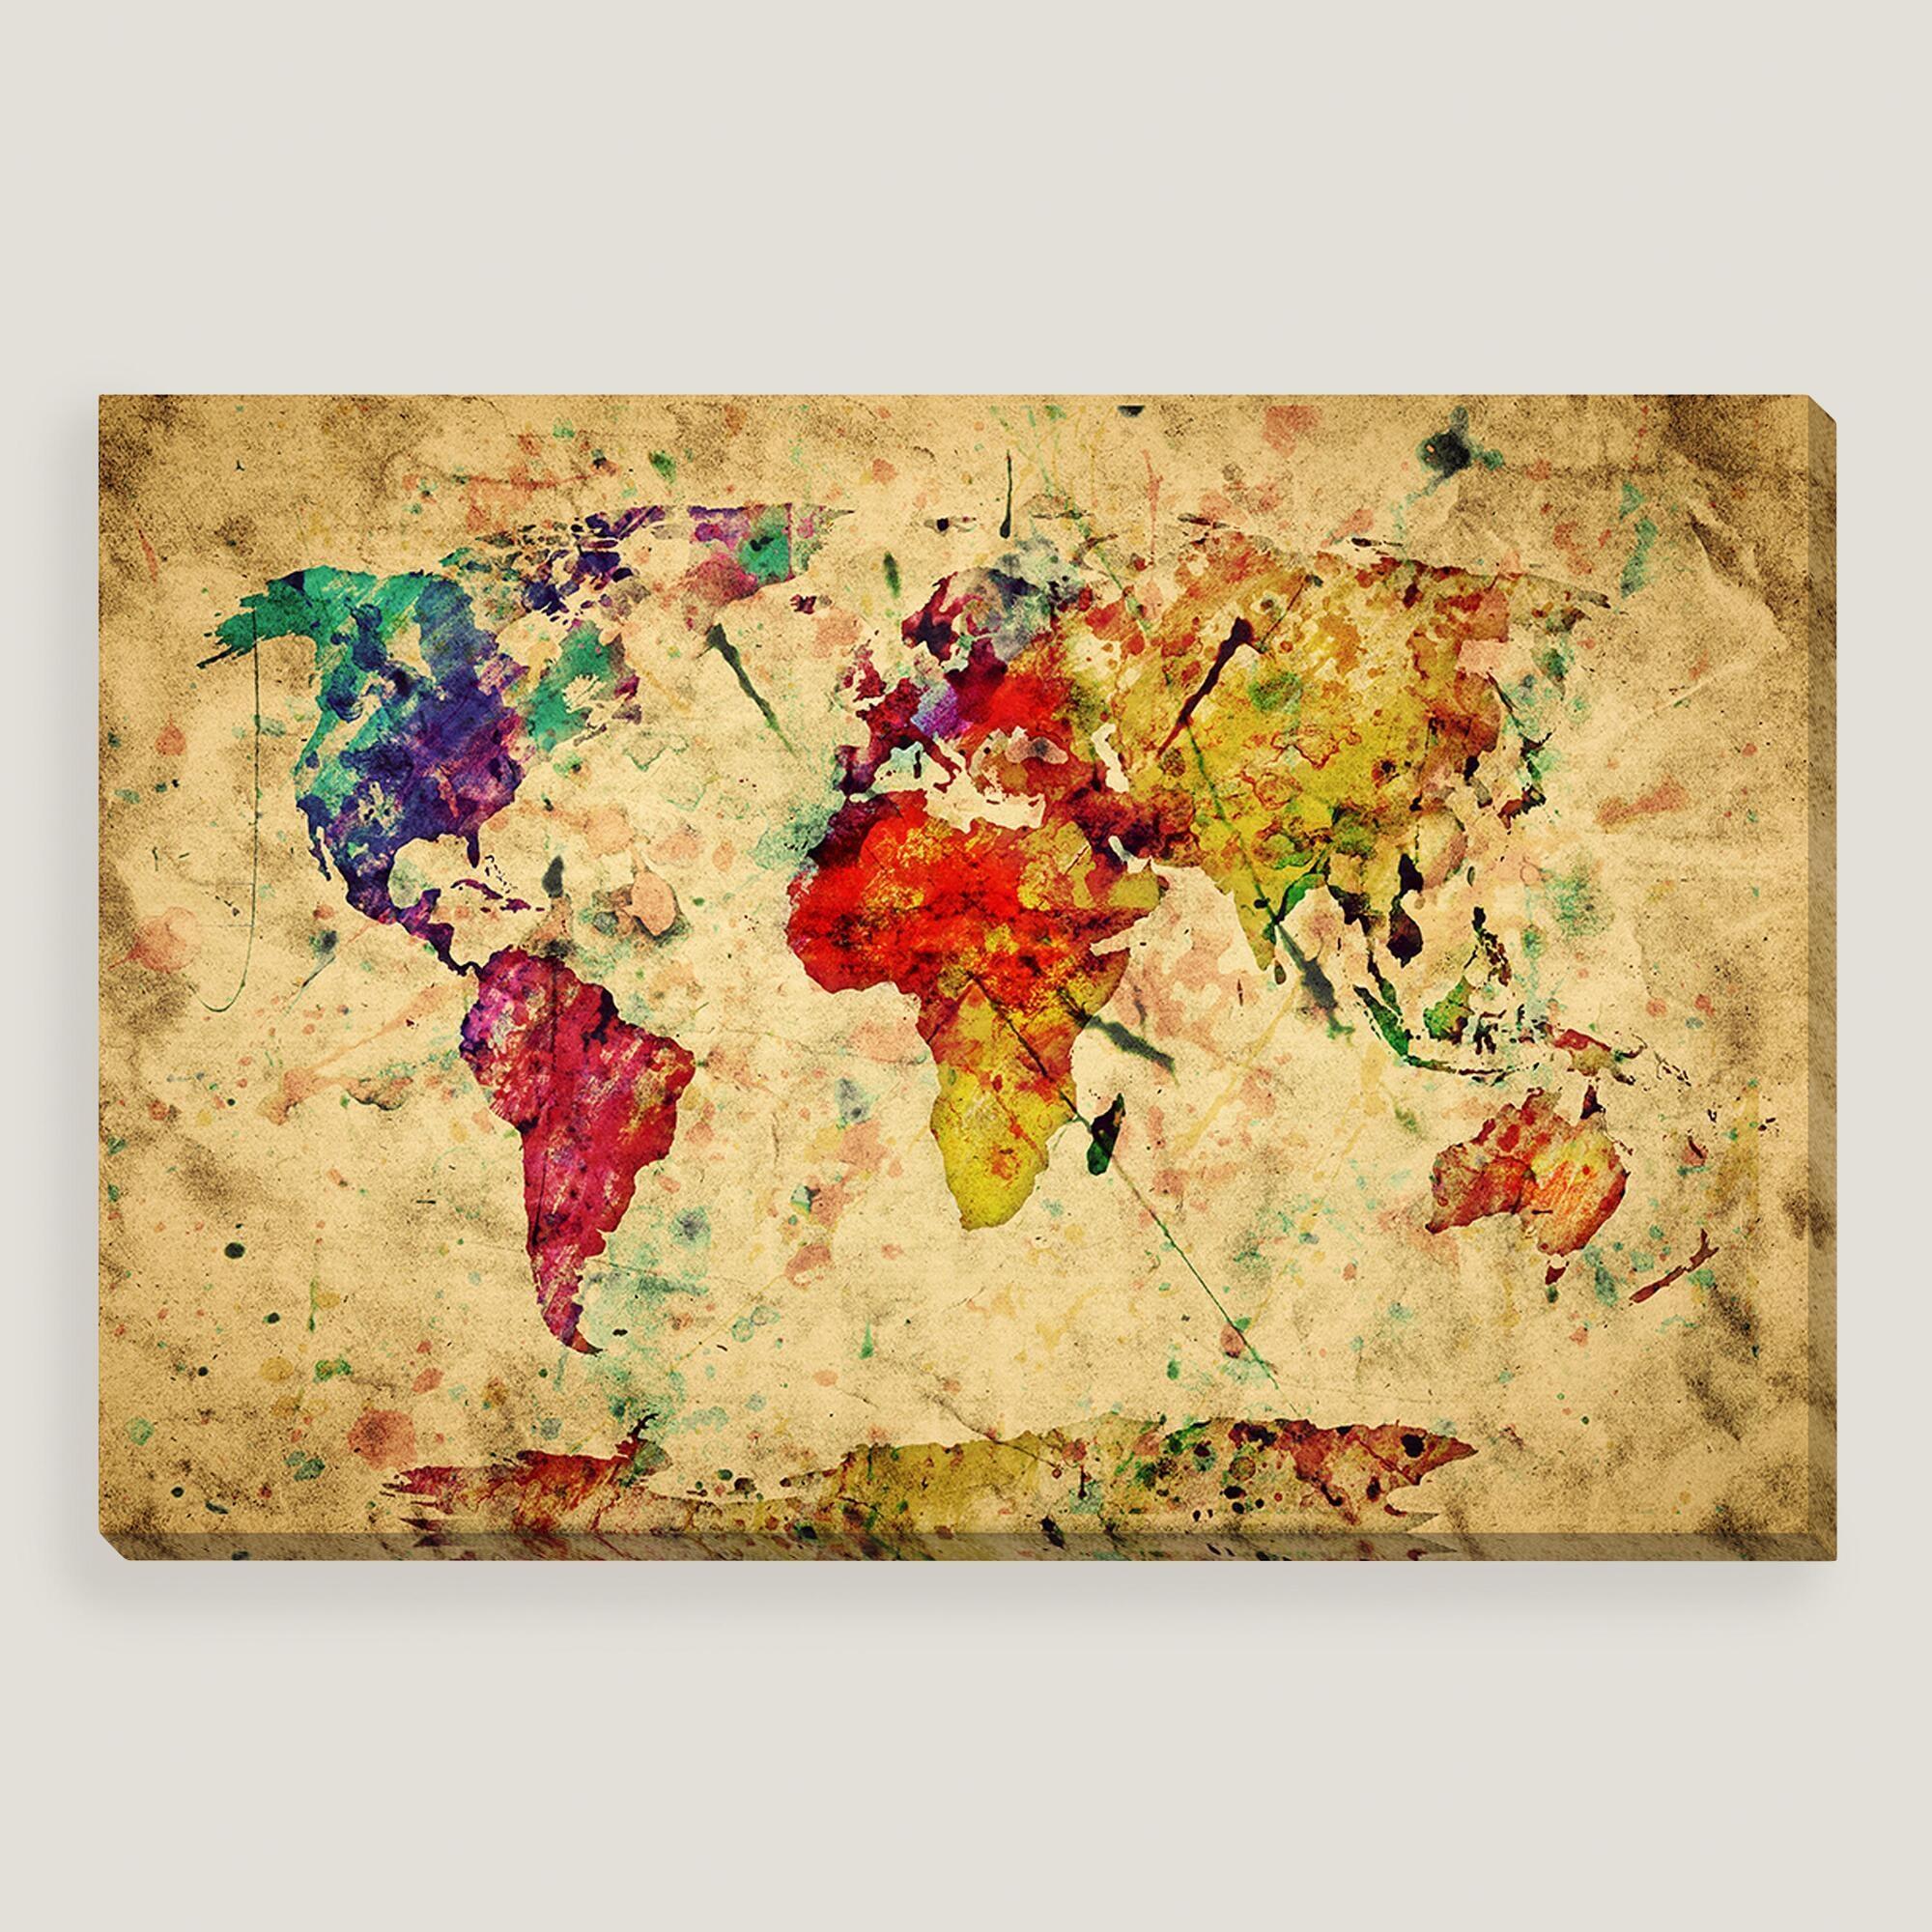 Wall Art Design Ideas: Customize Framed Vintage World Map Wall Art In Framed World Map Wall Art (Image 14 of 20)